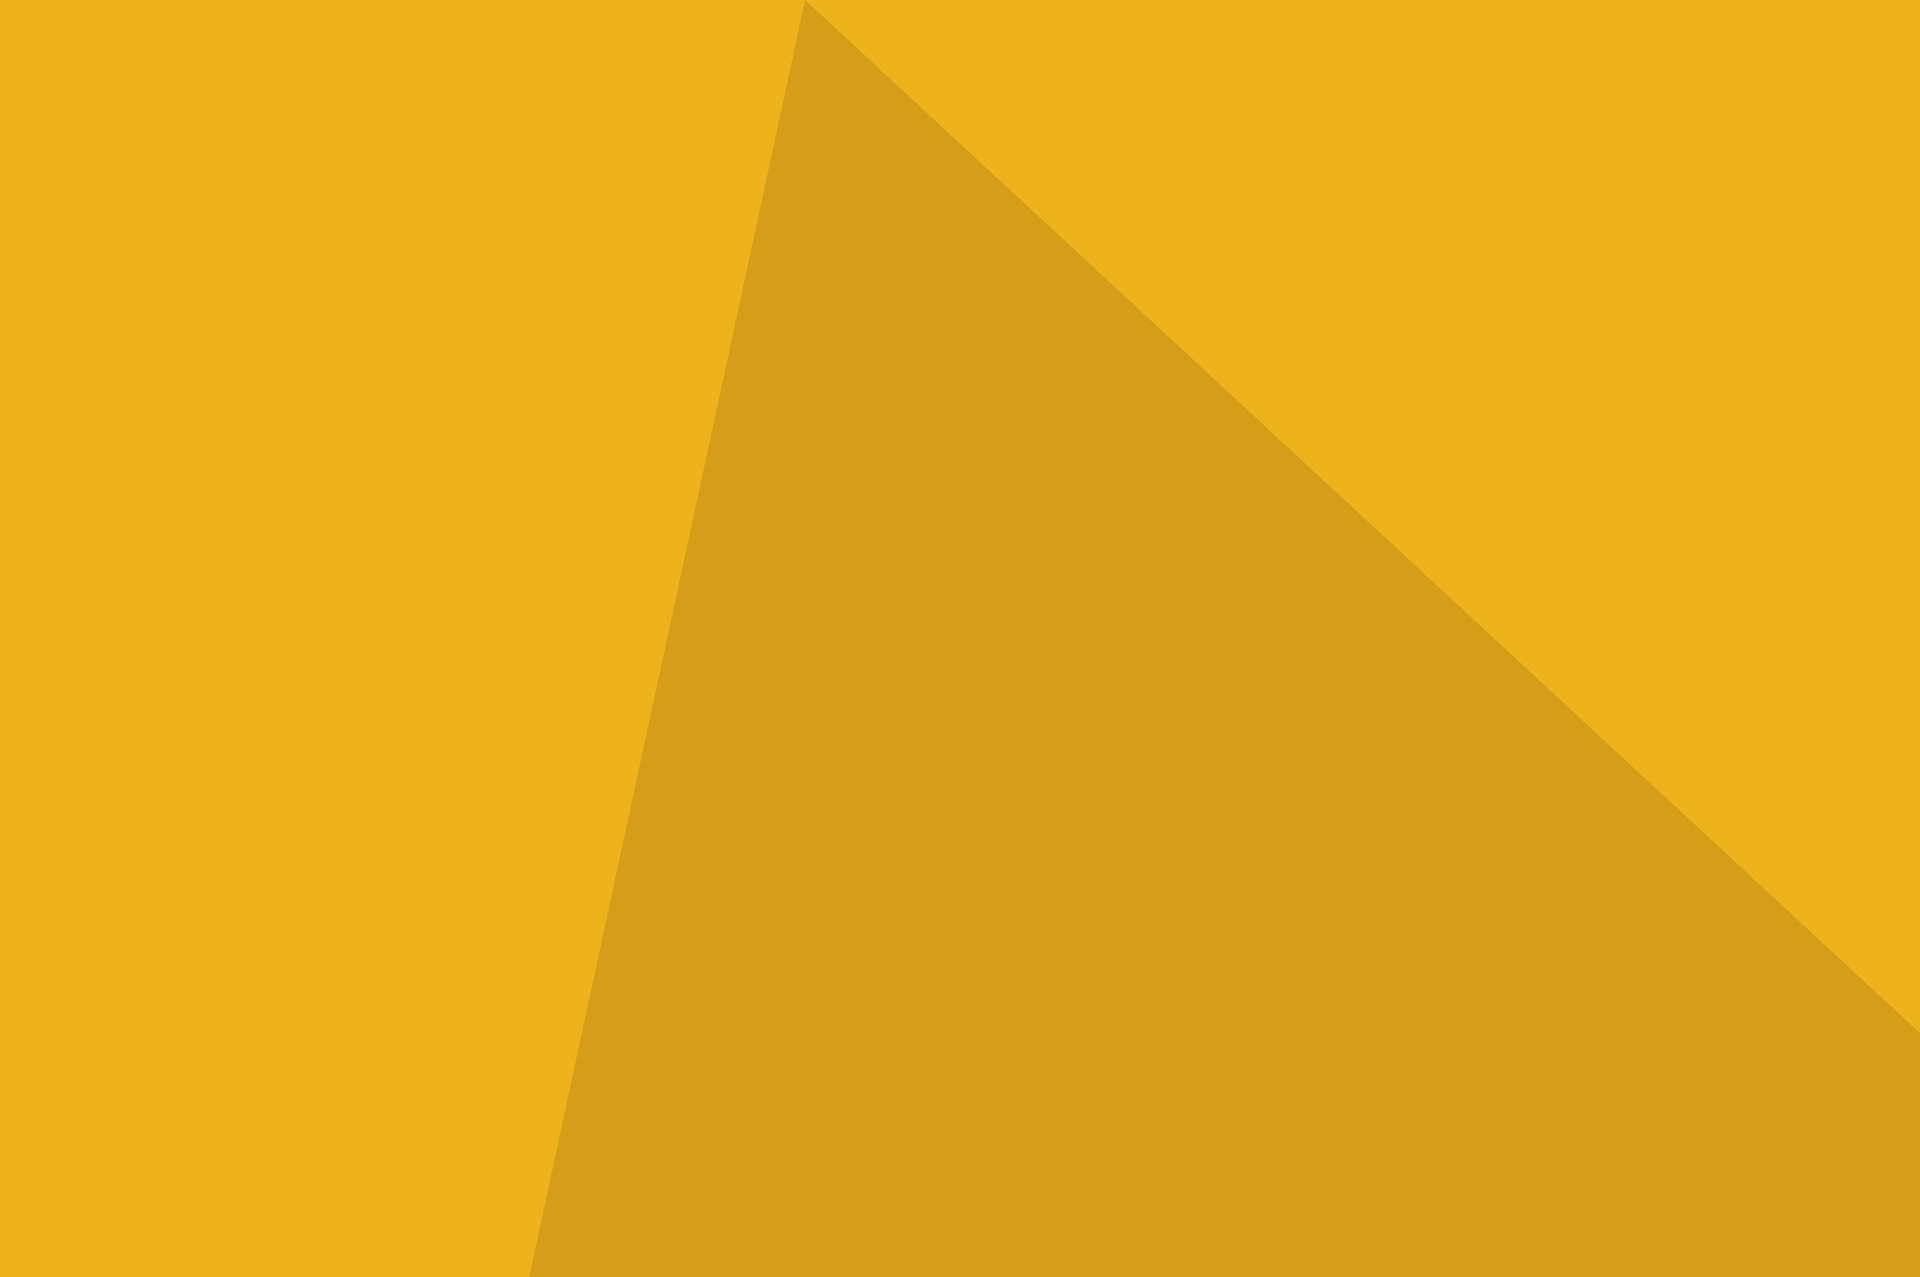 yellowbg2